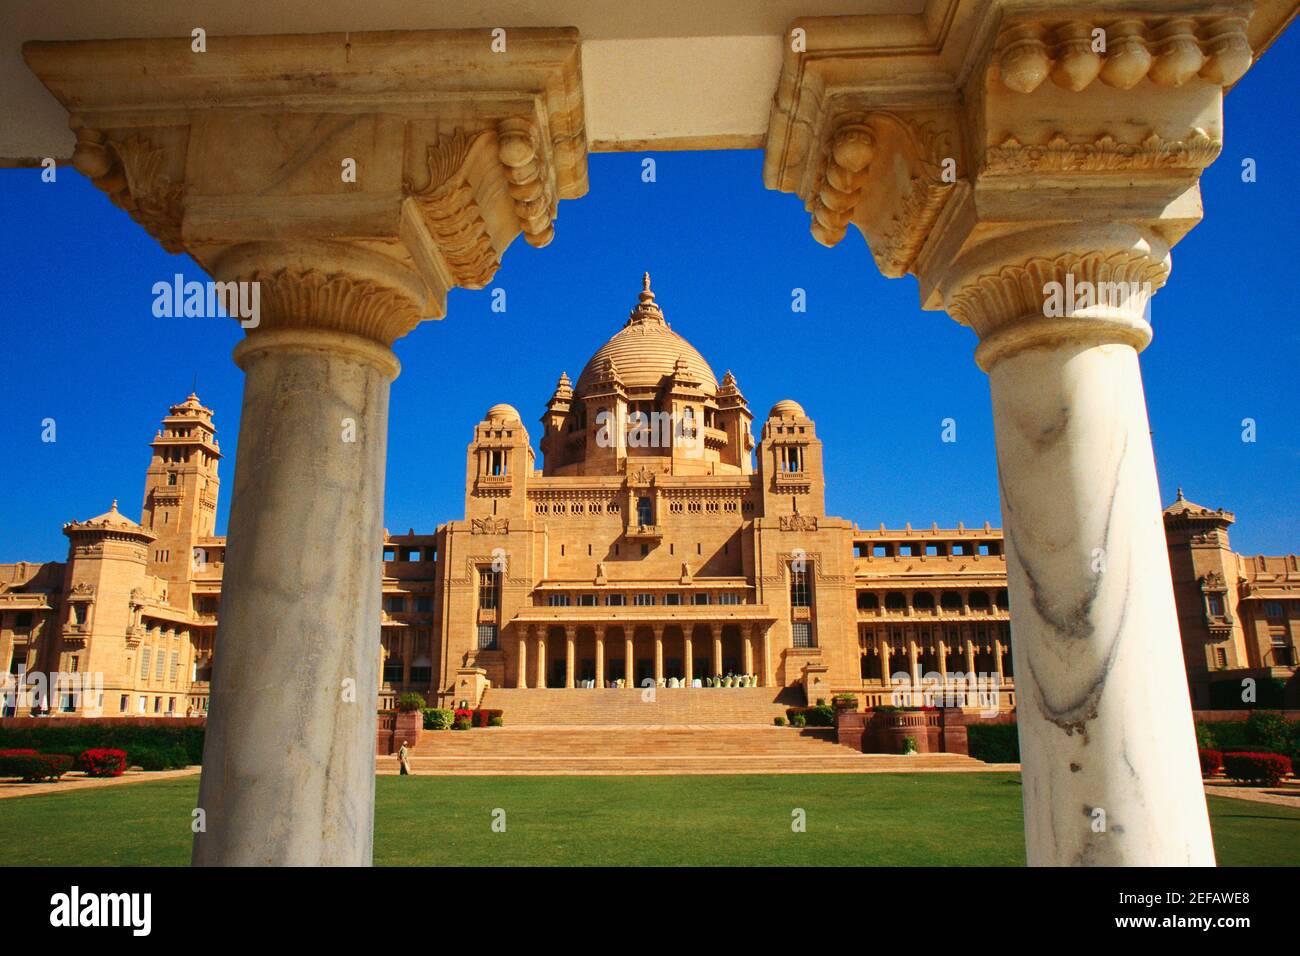 Facade of a palace, Limaid Bhawan Palace, Jodhpur, India Stock Photo